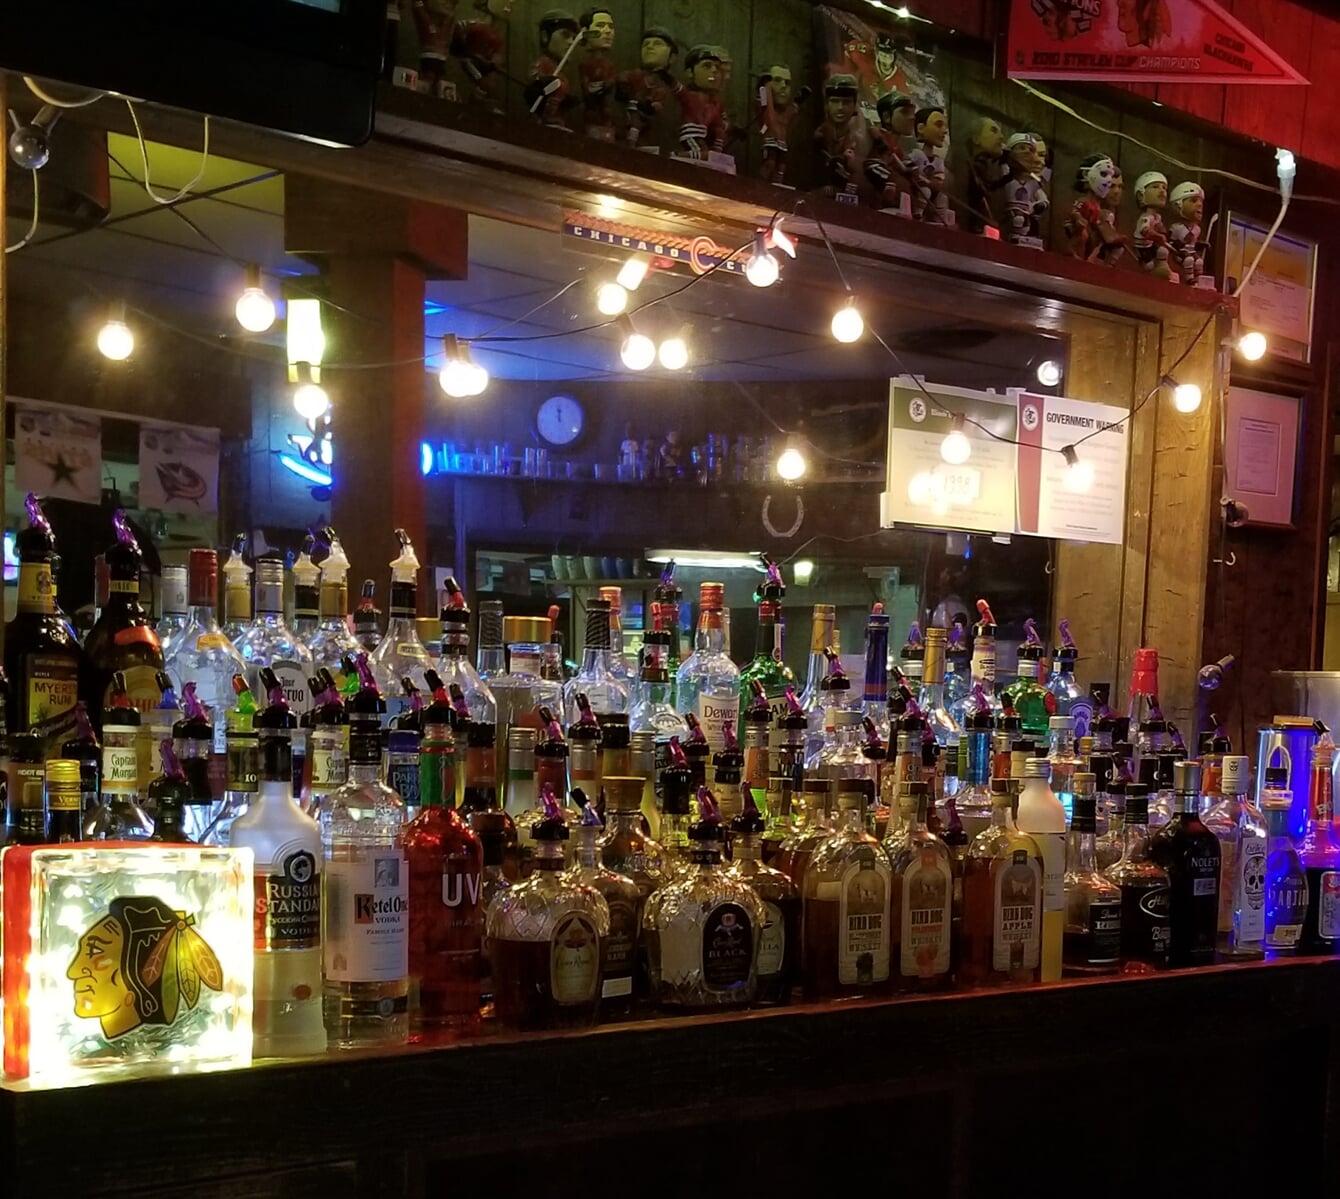 bar featuring hard liquor